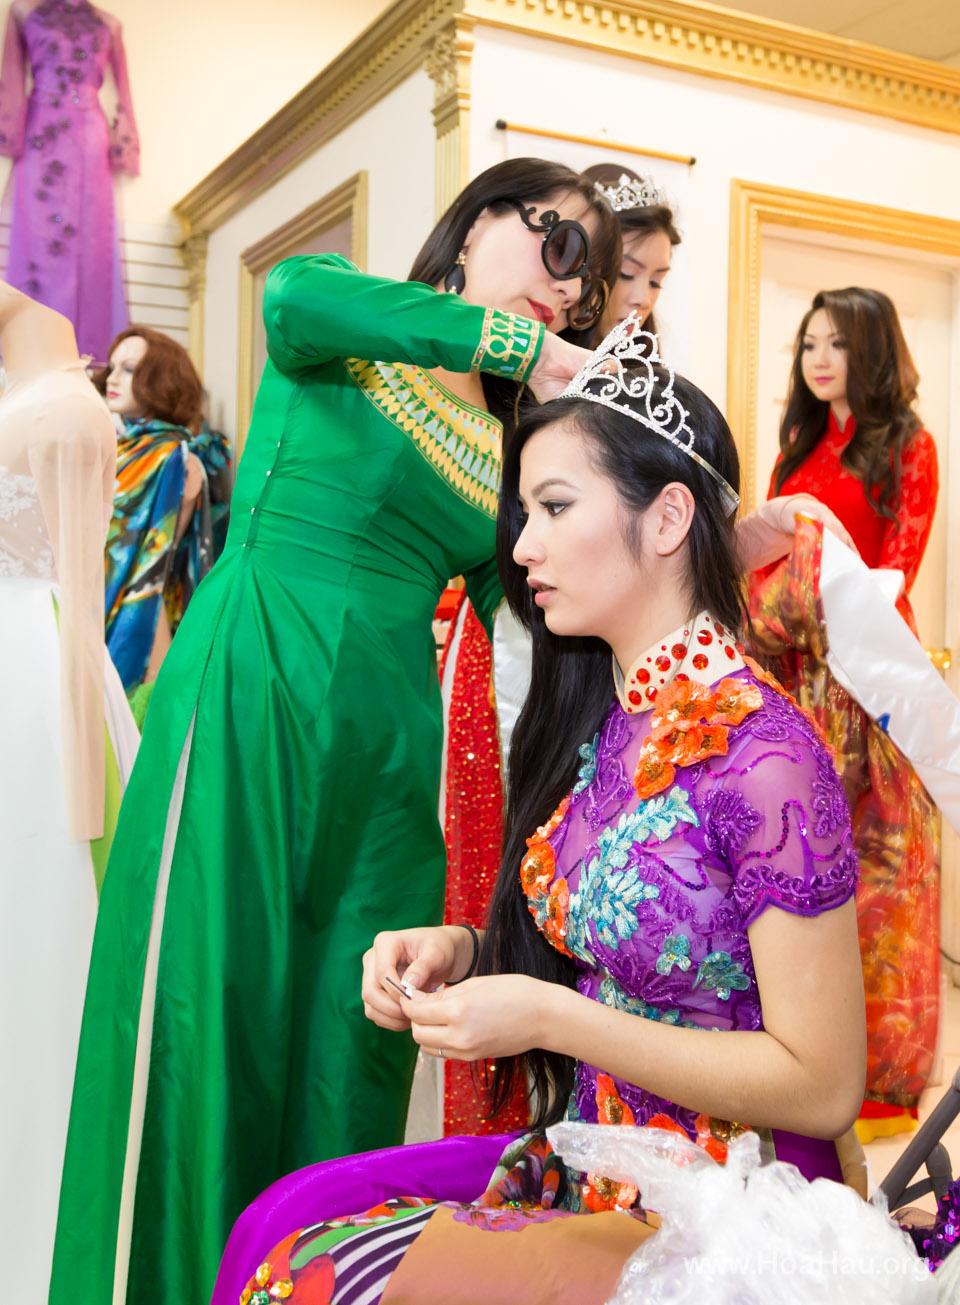 Tet Festival 2014 at Vietnam Town - Hoa Hau - Miss Vietnam - Image 164